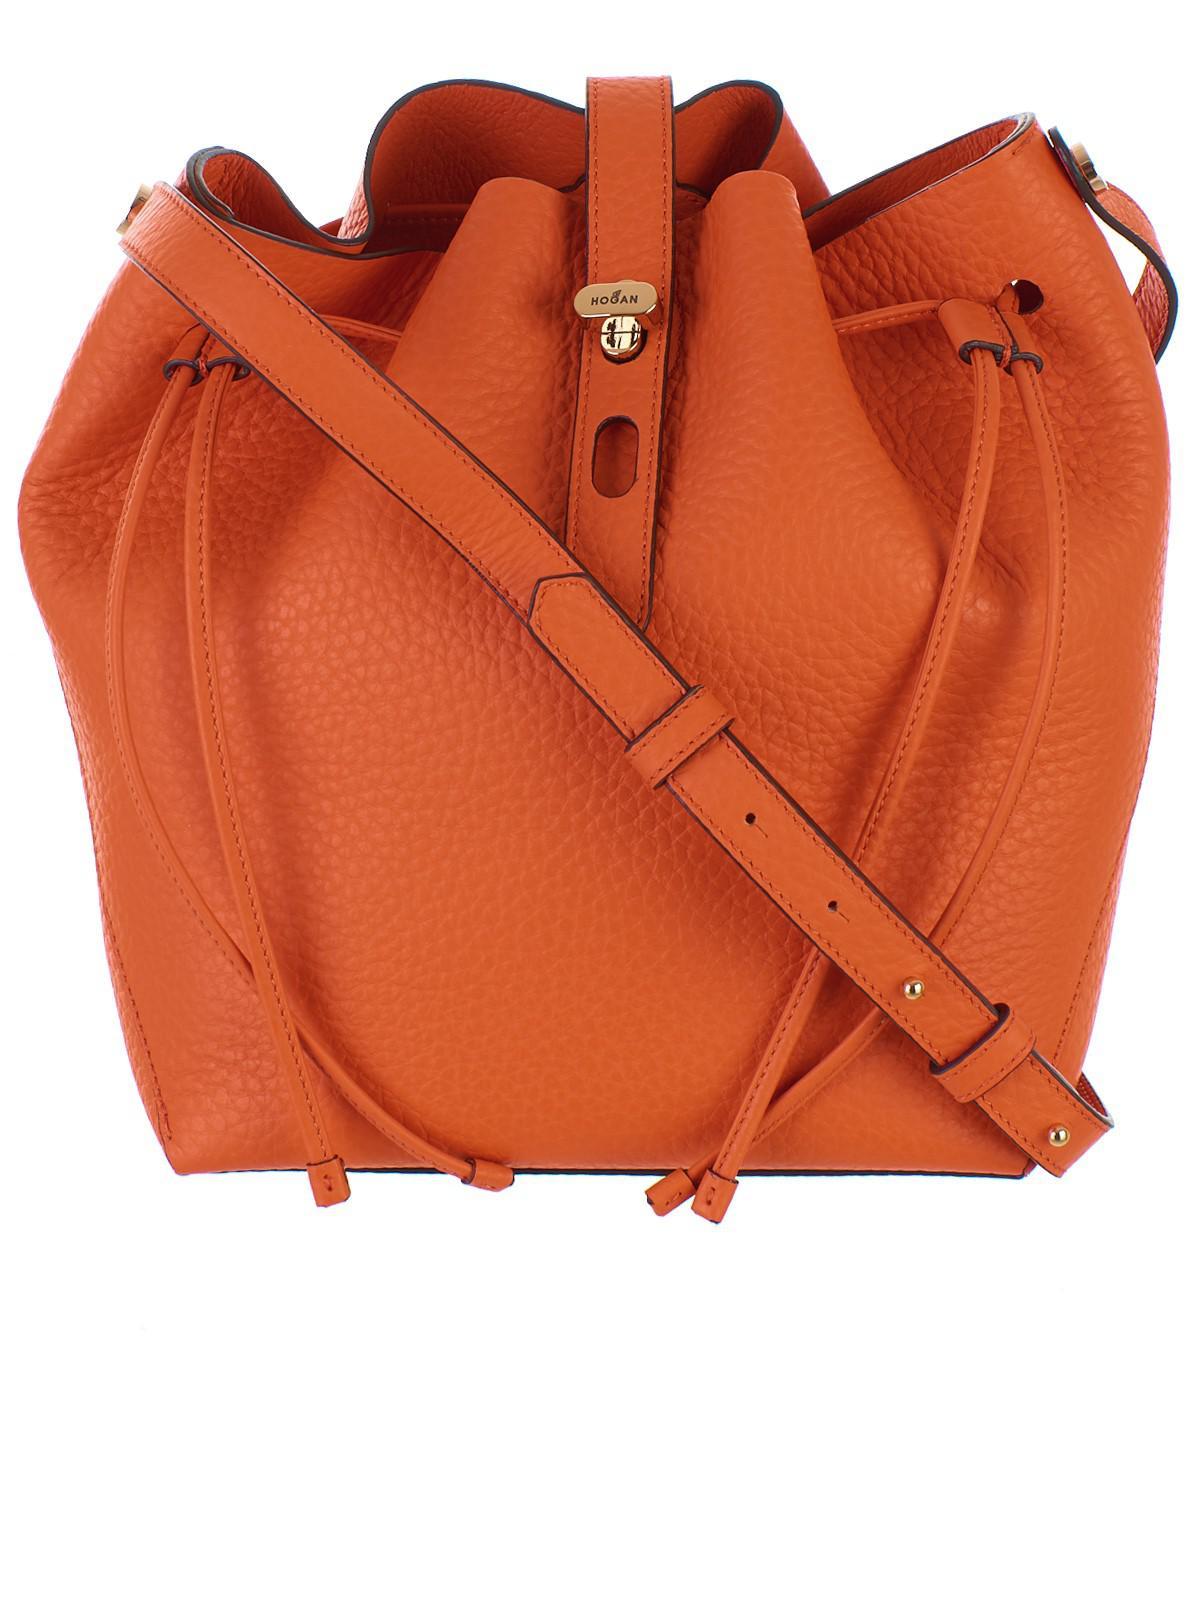 466c30f09f9 Hogan - Orange Bucket Bag - Lyst. View fullscreen